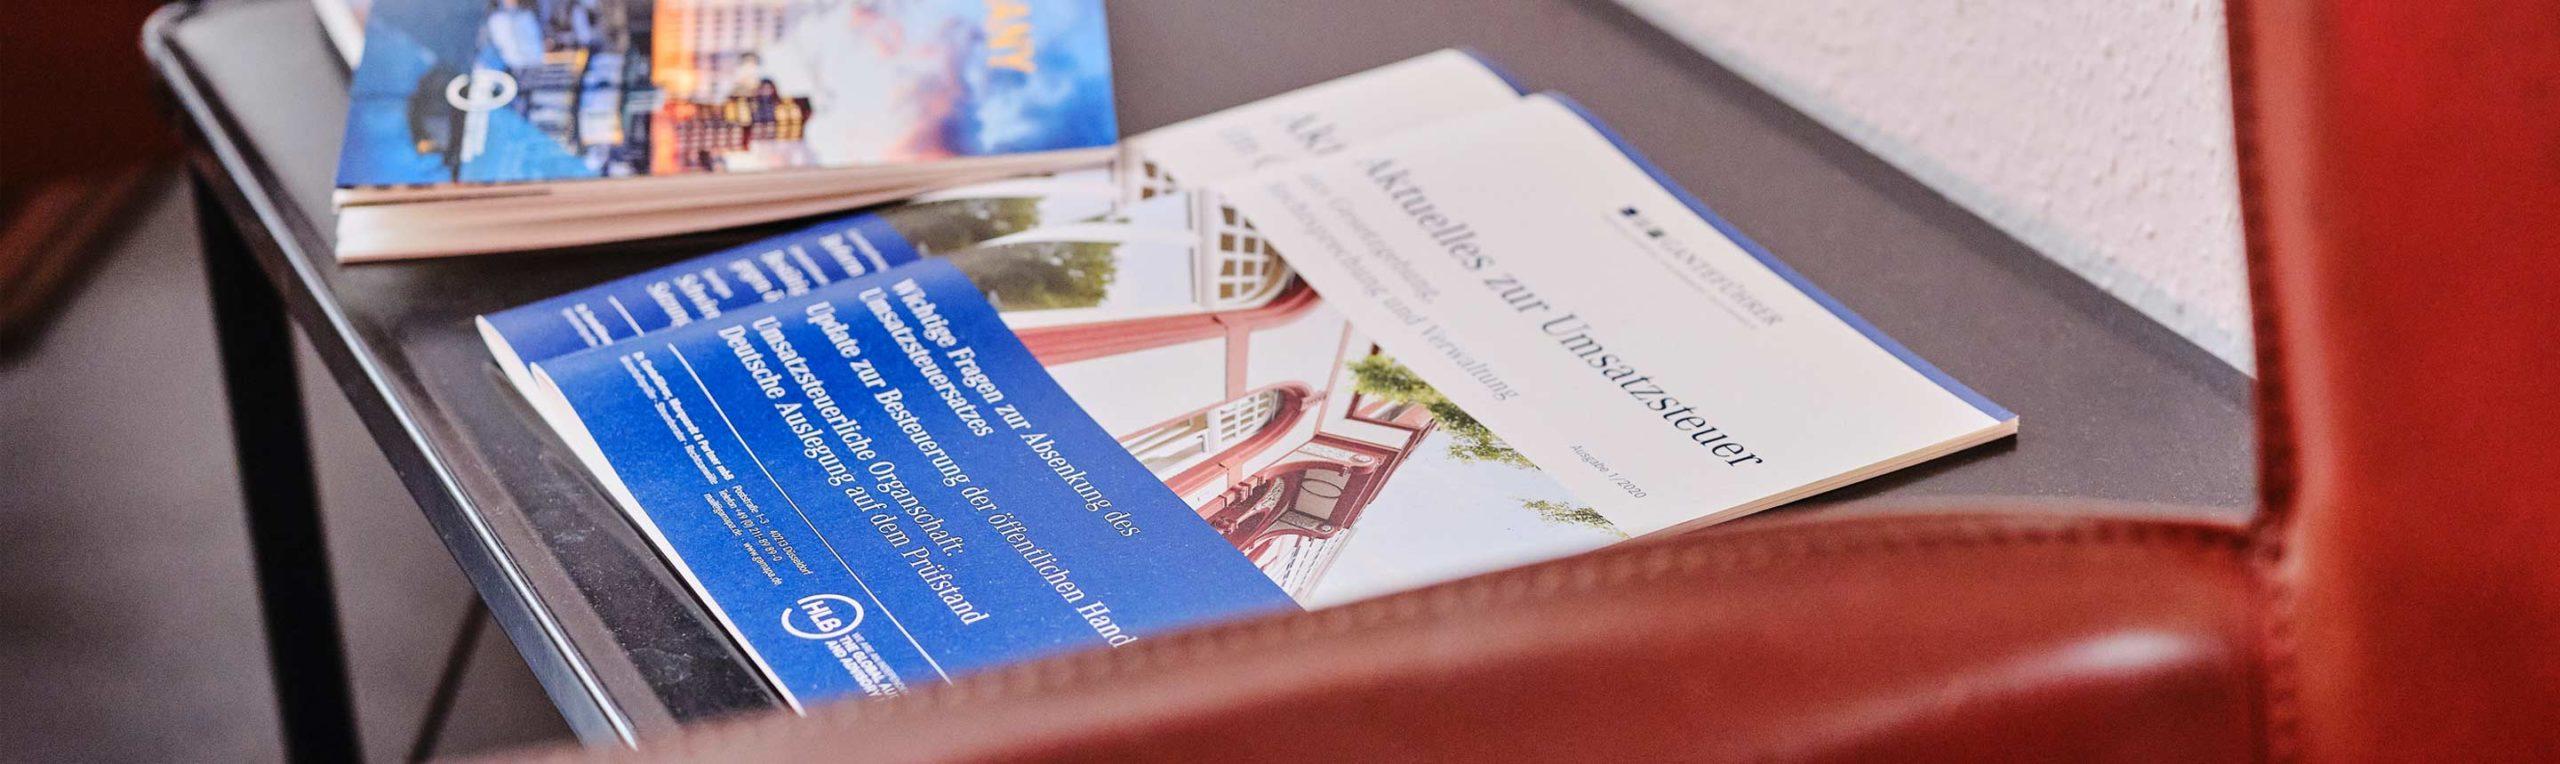 Aktuelles / Steuerrecht / Wirtschaftsrecht